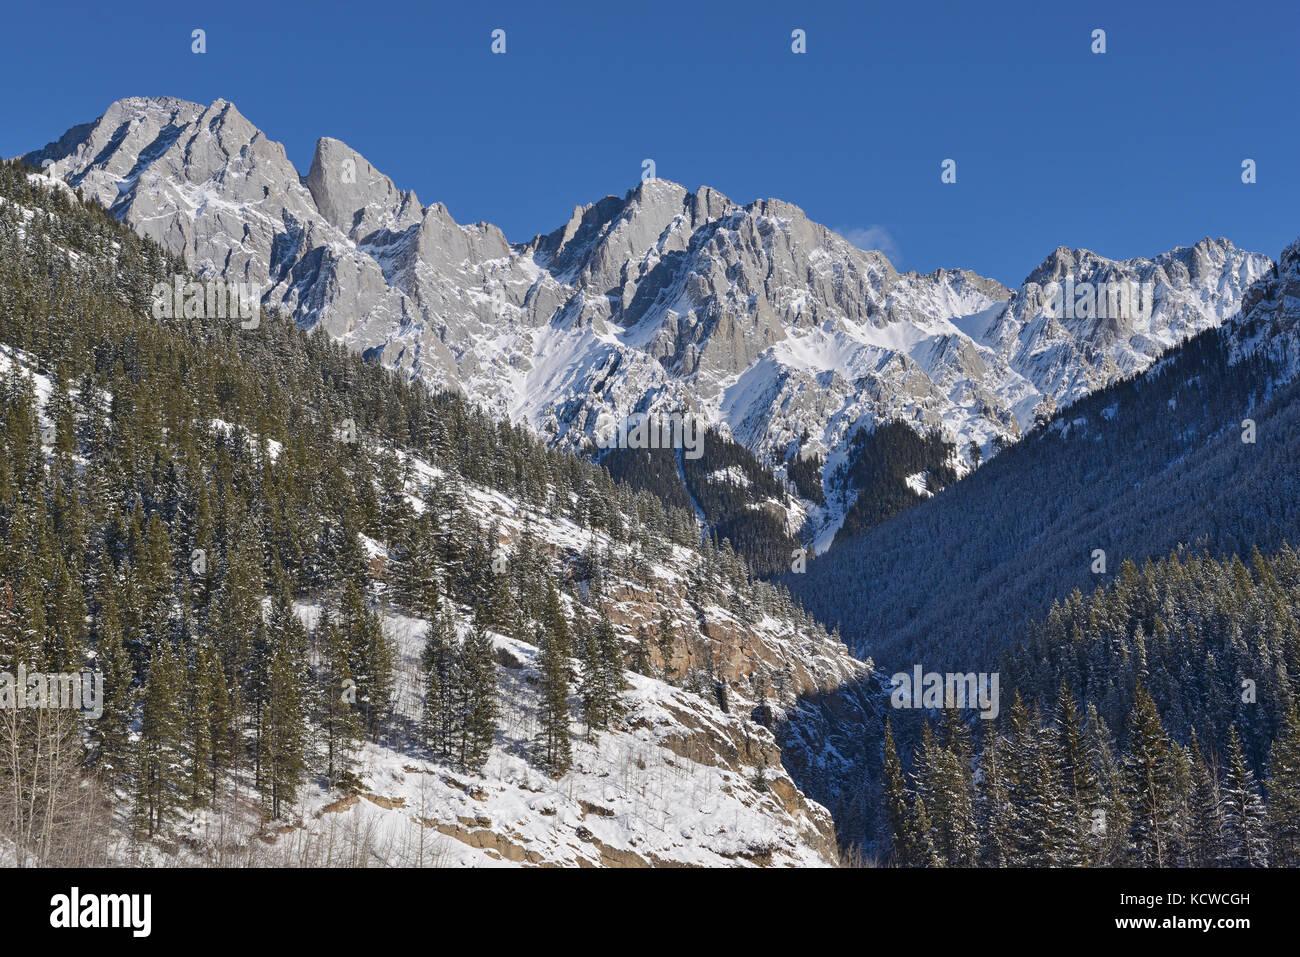 Canadian Rockies in winter. Highwood Pass, Kananaskis Country, Alberta, Canada - Stock Image